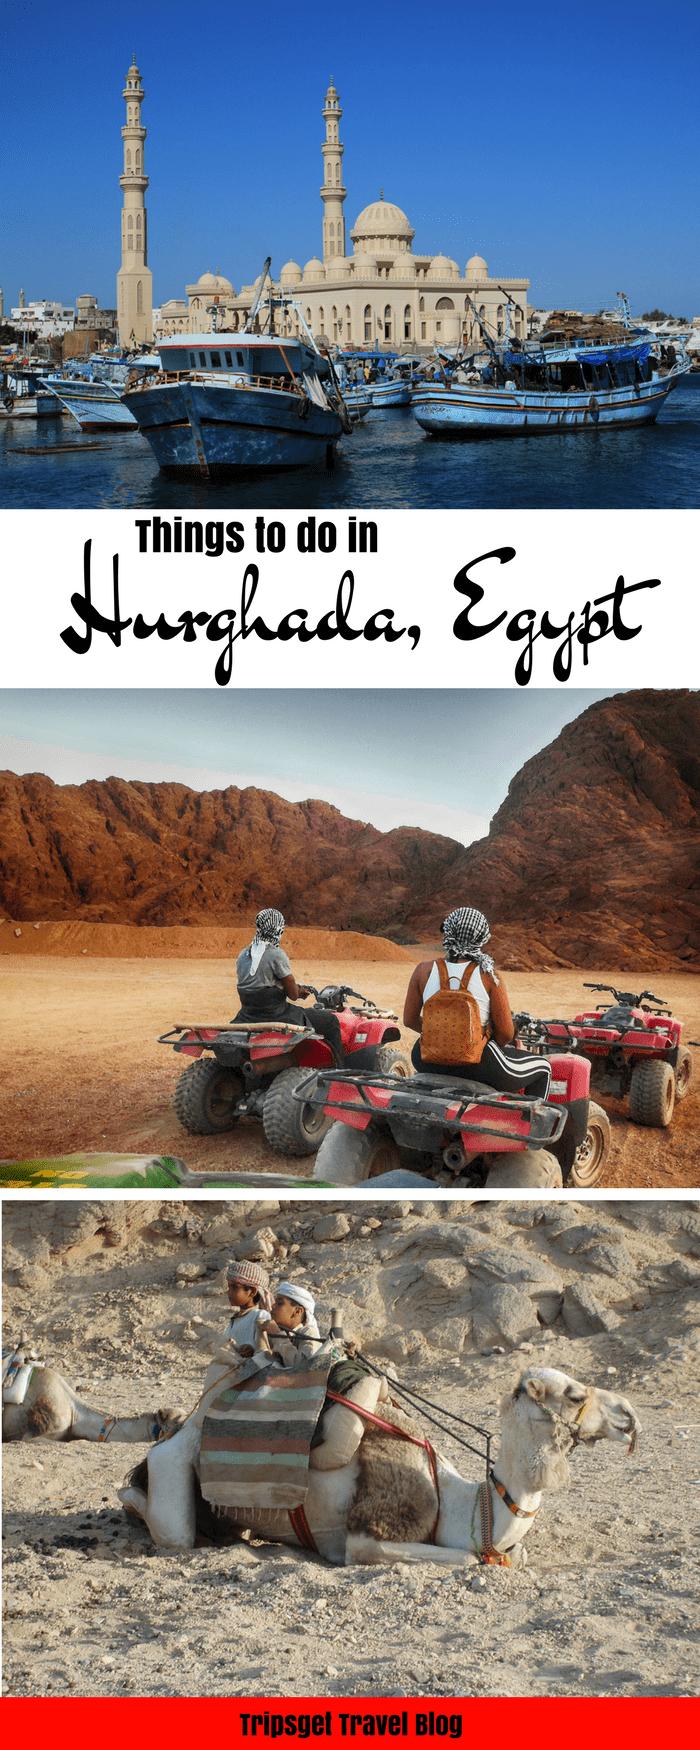 Tours from Hurghada. Activities and tours to take from Hurghada, Egypt. Best Hurghada tours. Safari tour. Camel tour. Sahara Desert. Cairo, Luxor, Egypt travel.